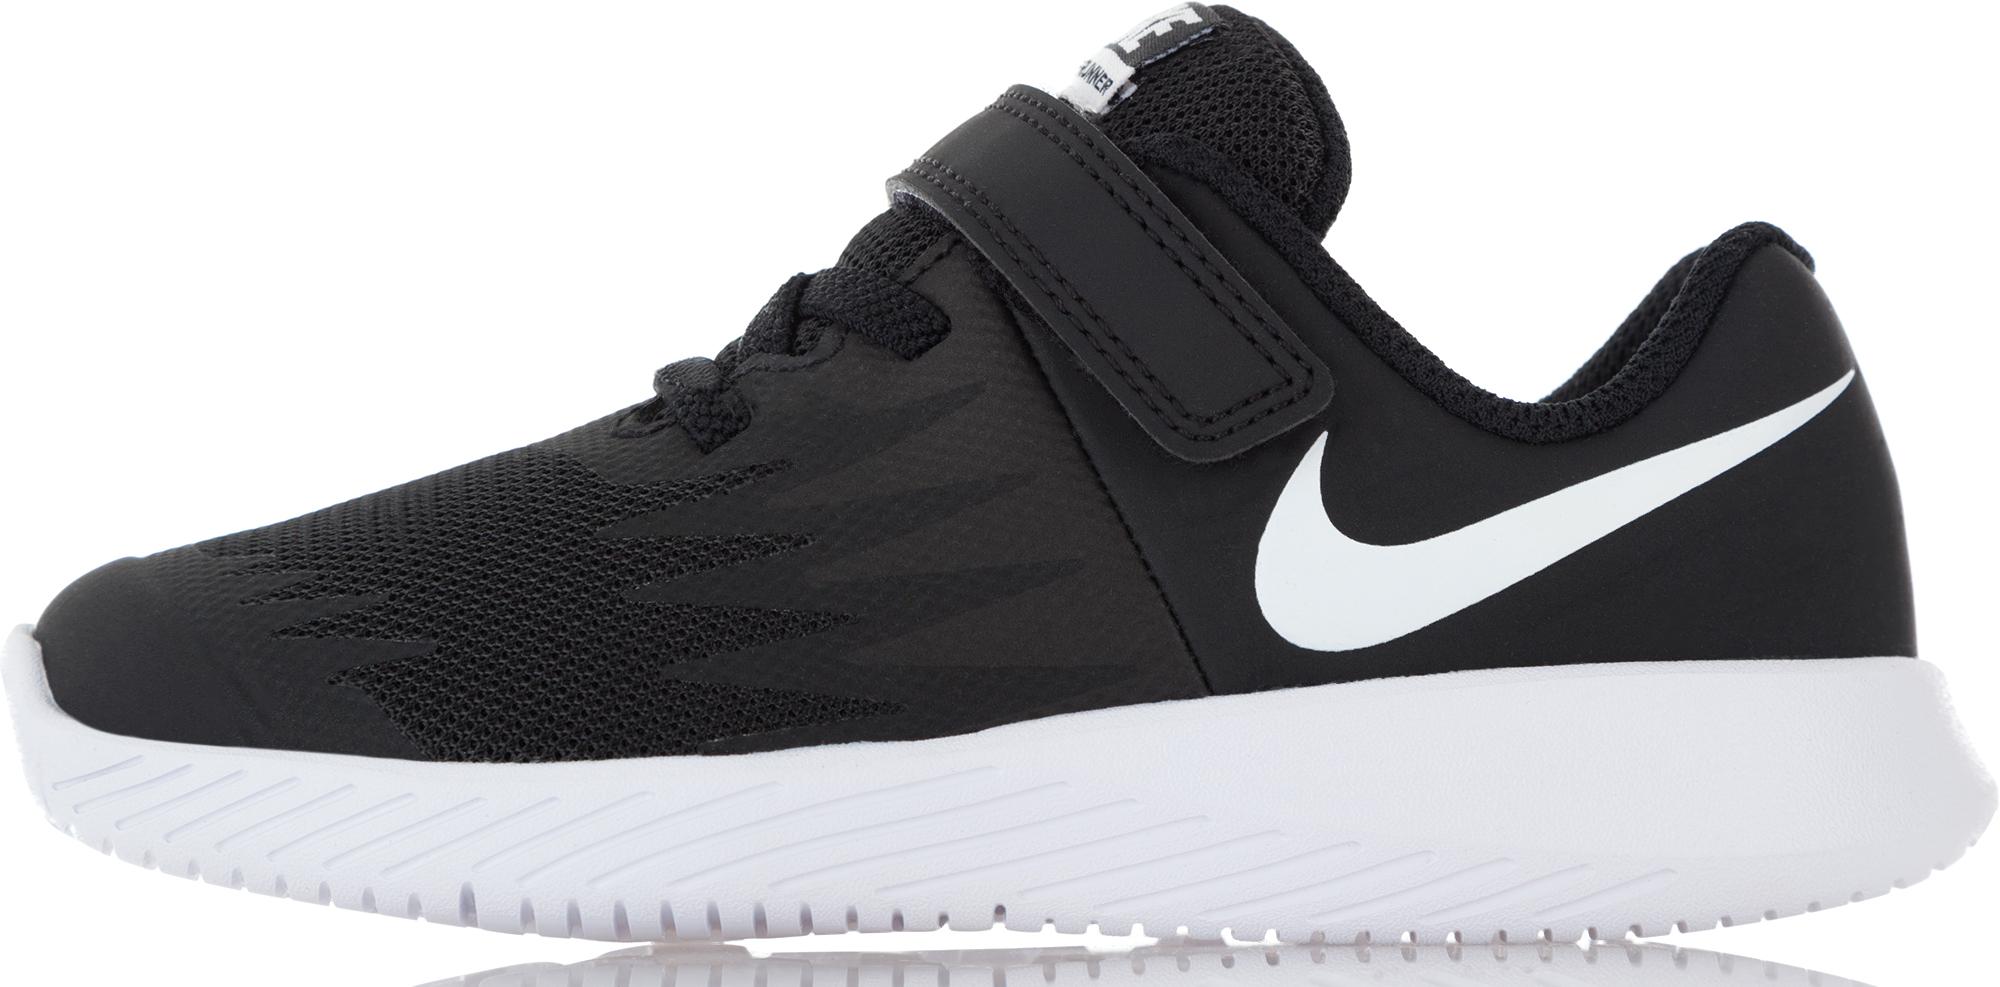 Nike Кроссовки для мальчиков Nike Star Runner кроссовки nike кроссовки nike md runner 2 749794 410